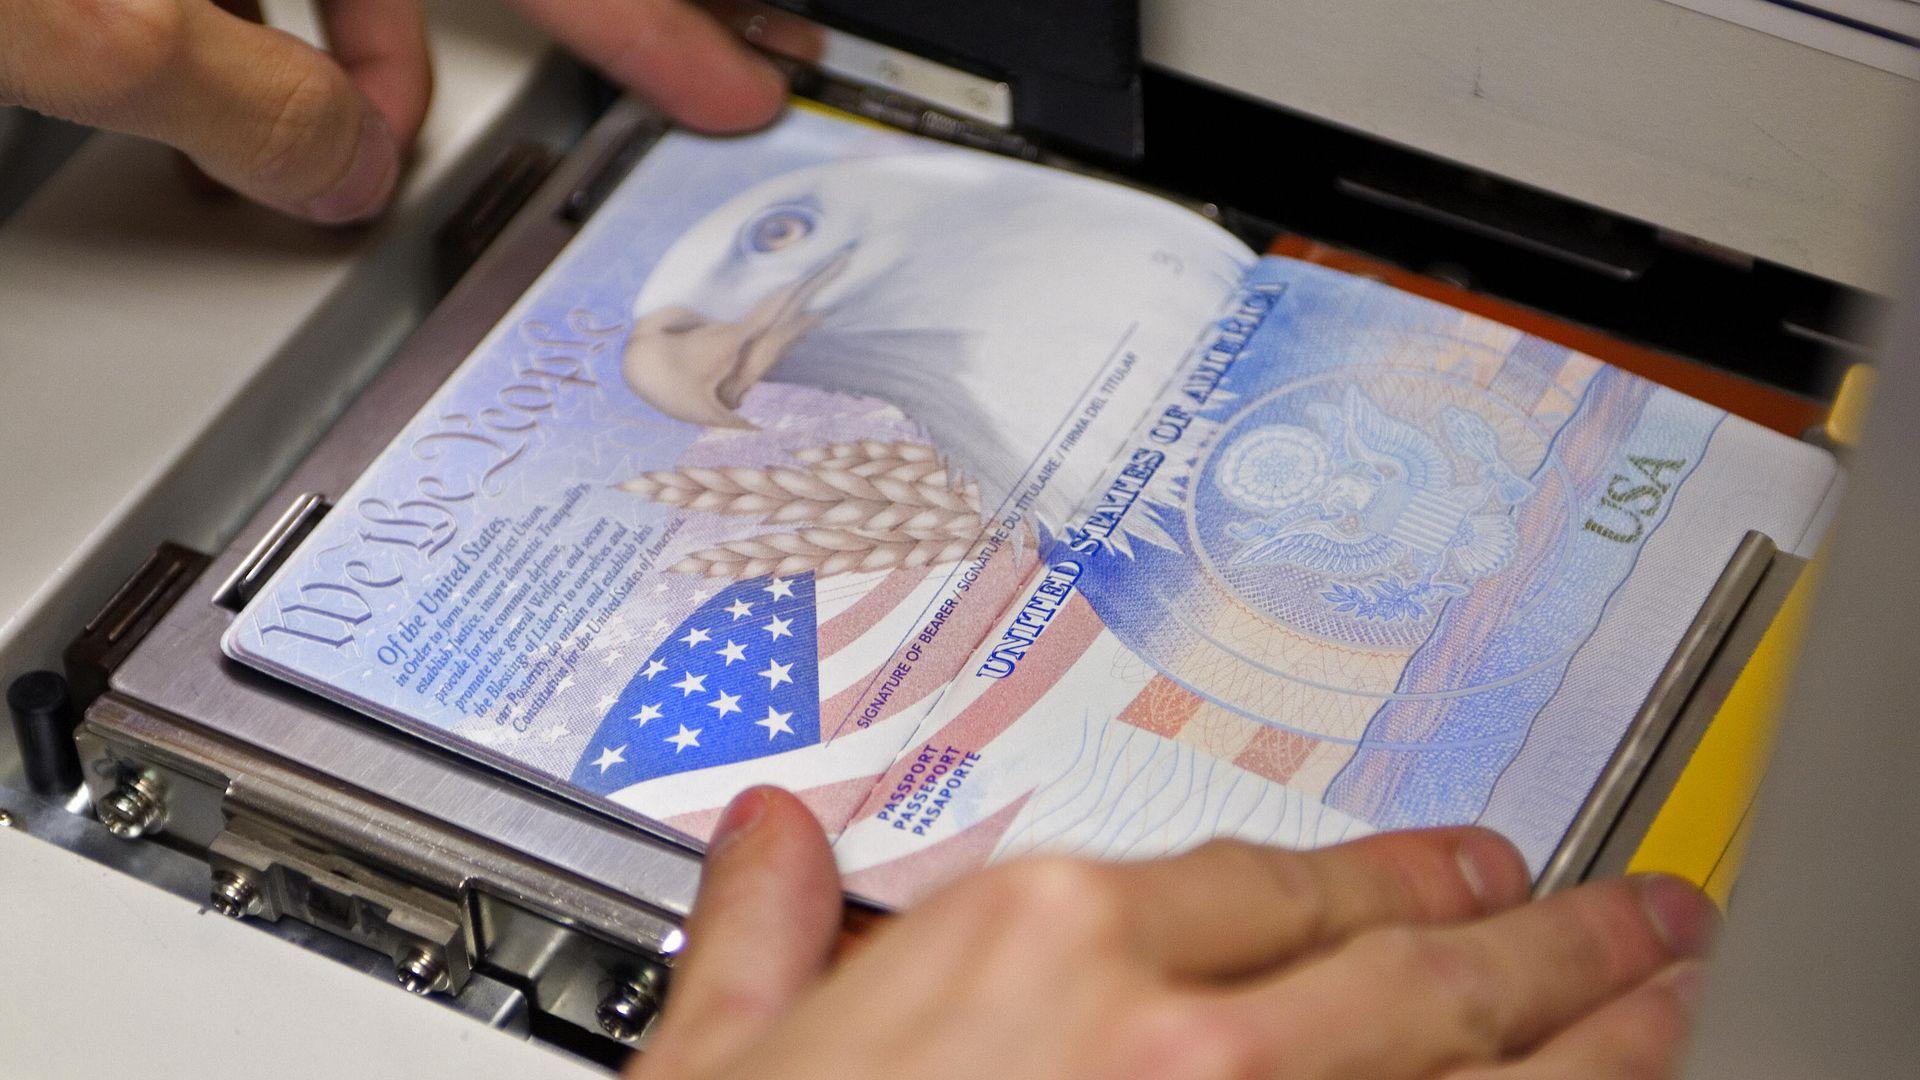 A United States passport